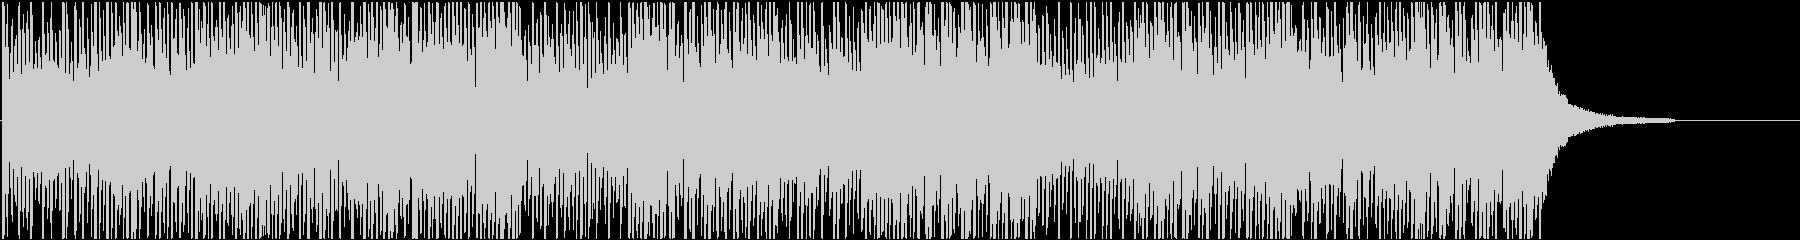 News7 16bit48kHzVerの未再生の波形